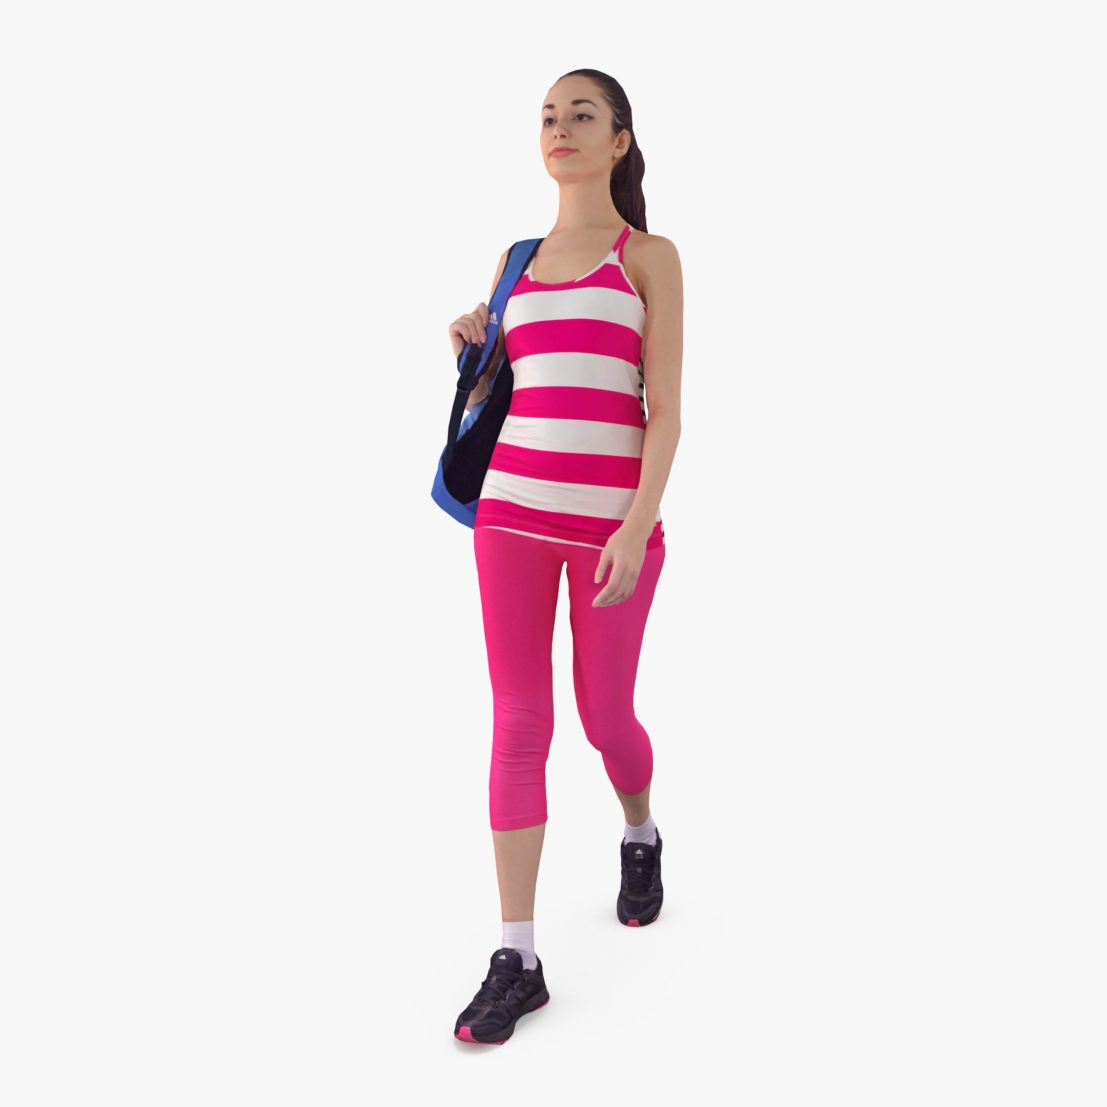 Fit Girl Walking 3D Model | 3DTree Scanning Studio